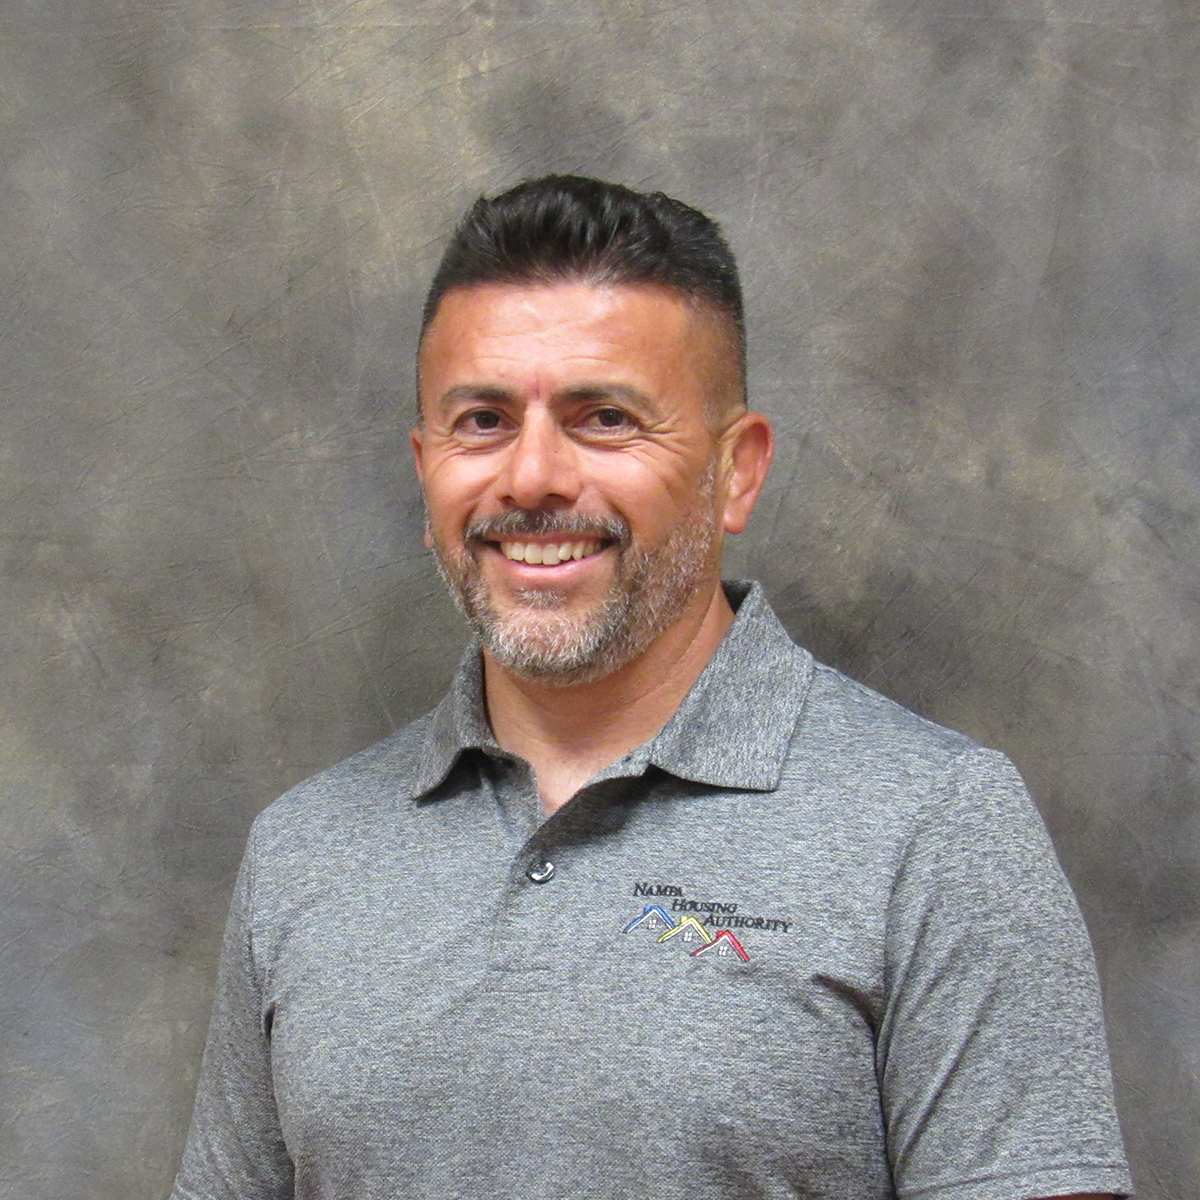 Rudy Gonzalez, Maintenance Operations Supervisor